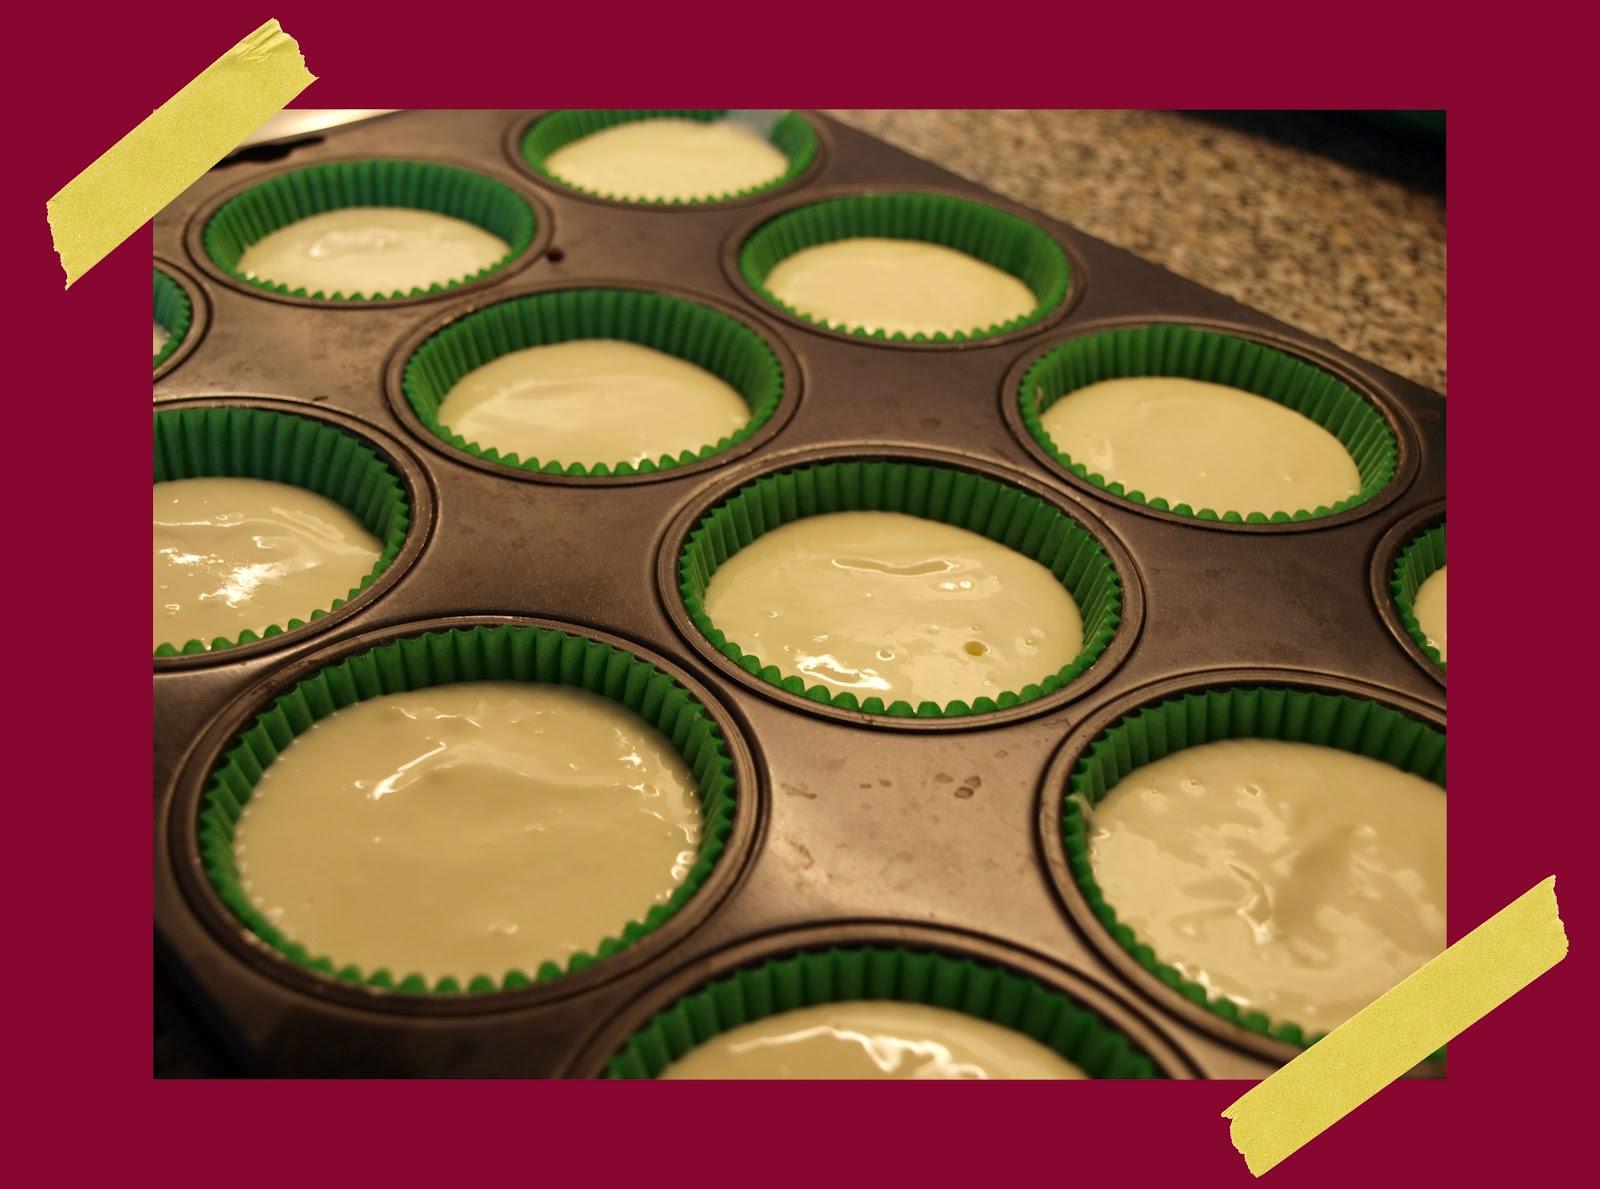 Little Bakery Nachgebacken Kasekuchen Muffins